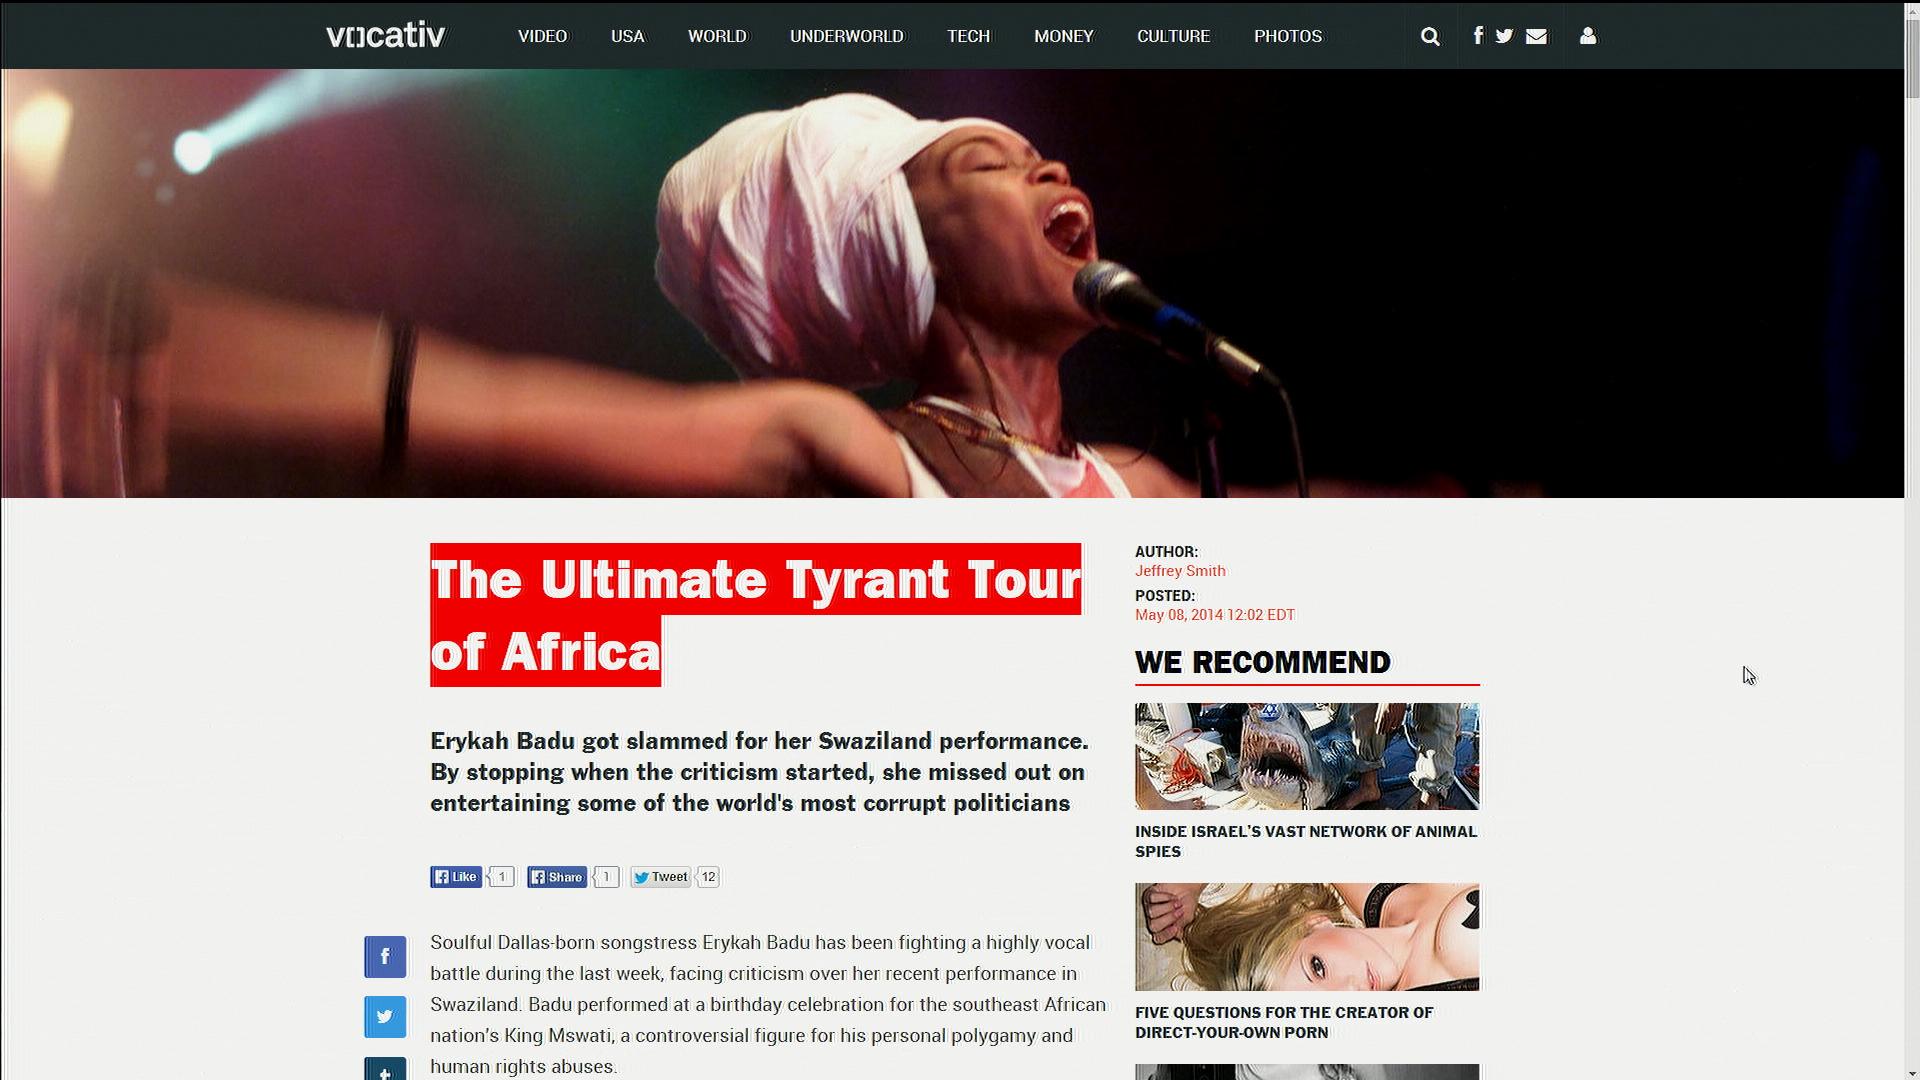 Erykah Badu defends Swaziland performance